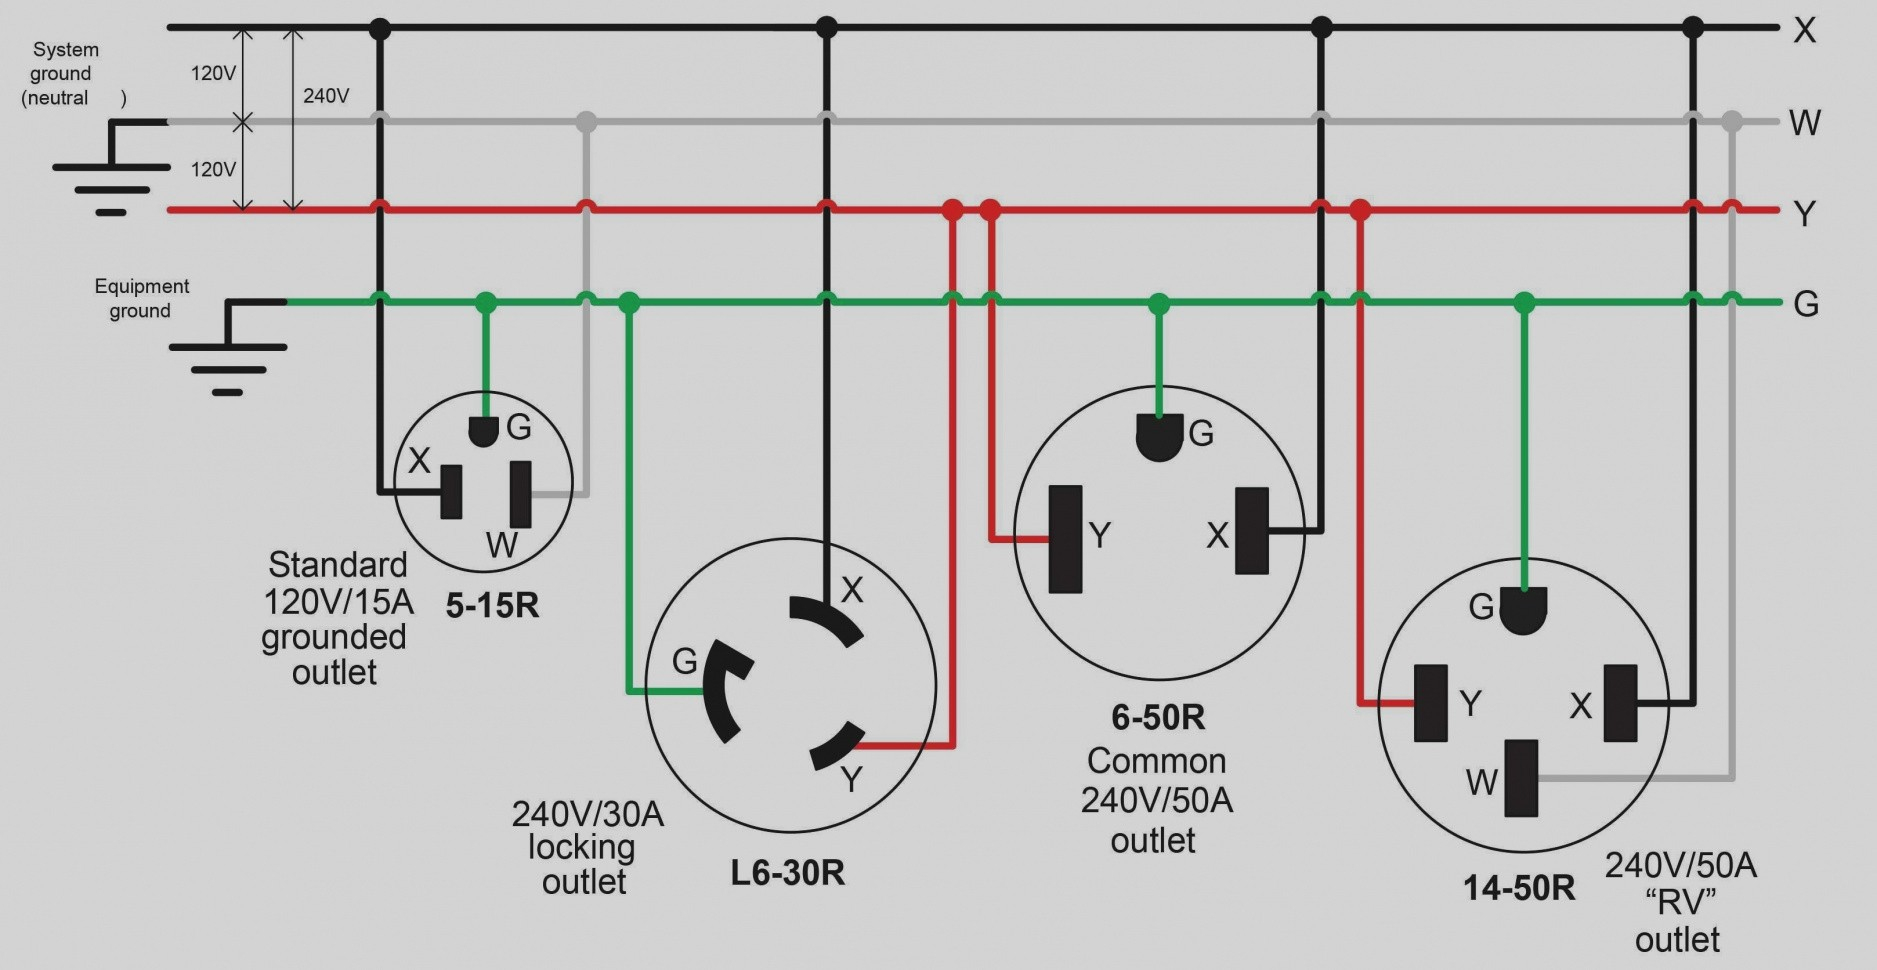 30 Amp Rv Plug Wiring Diagram   Manual E-Books - 30 Amp Rv Plug Wiring Diagram